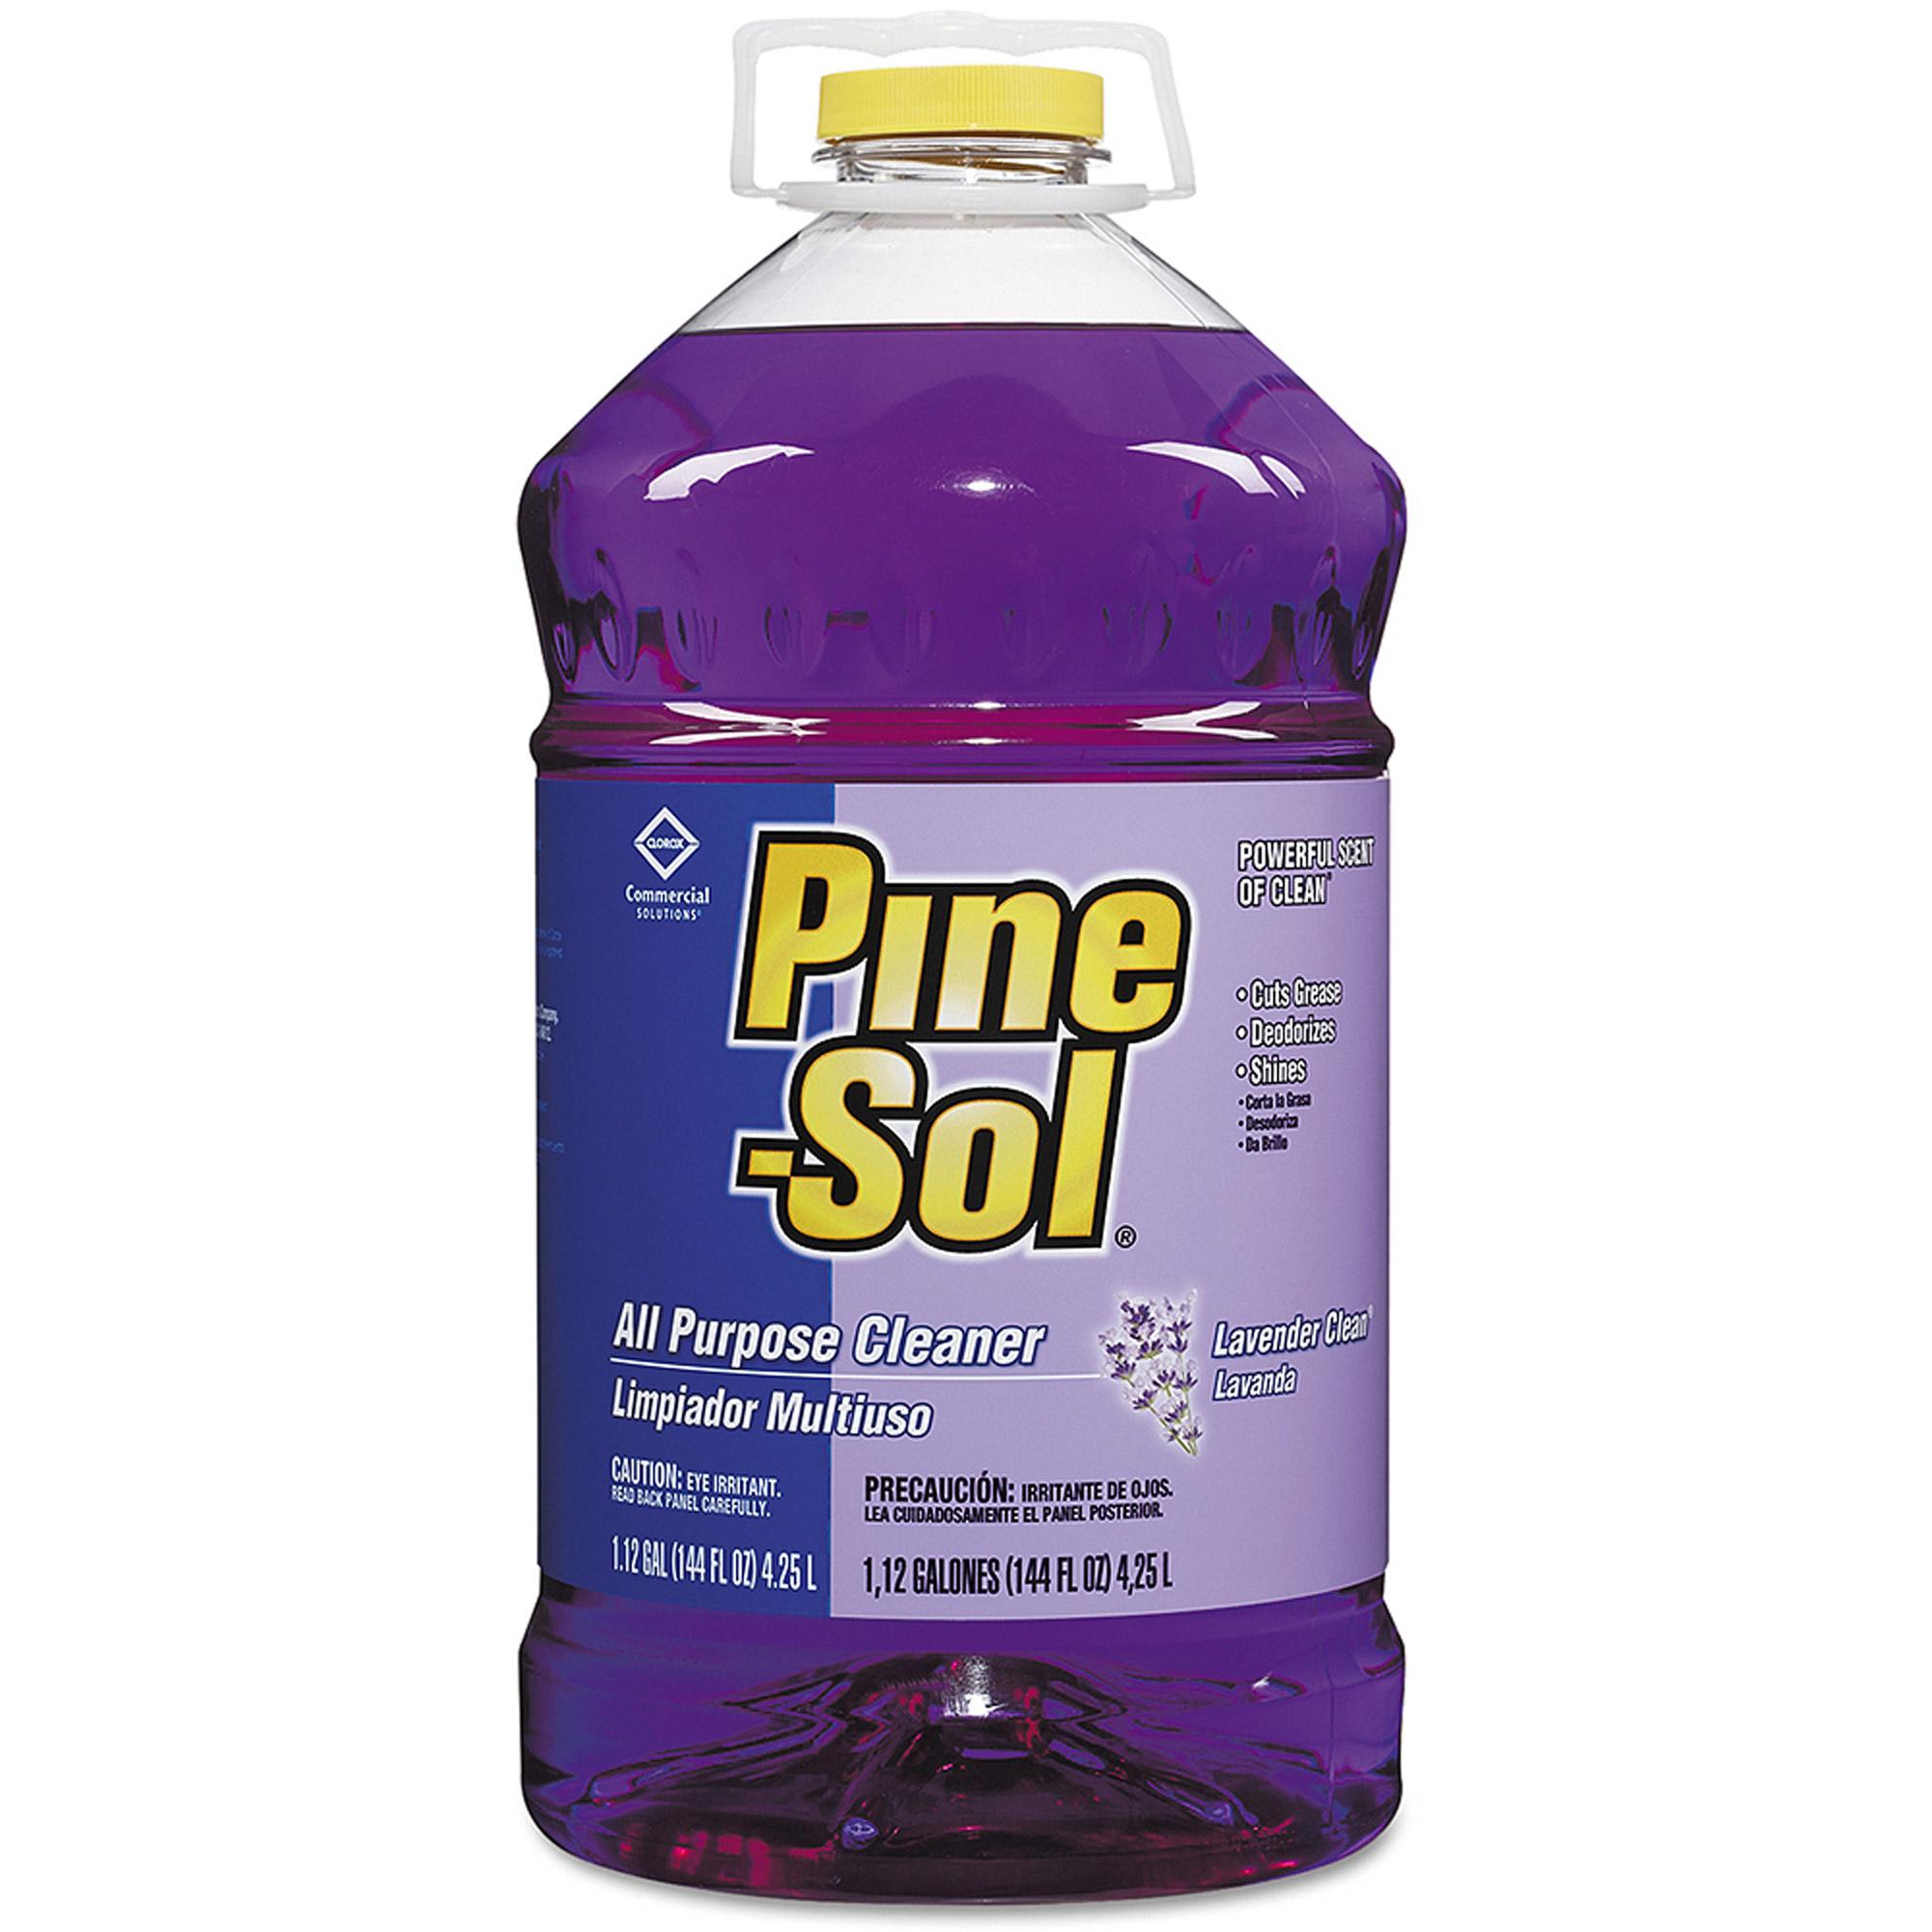 Pine-Sol Lavender Clean All-Purpose Cleaner, 144 fl oz